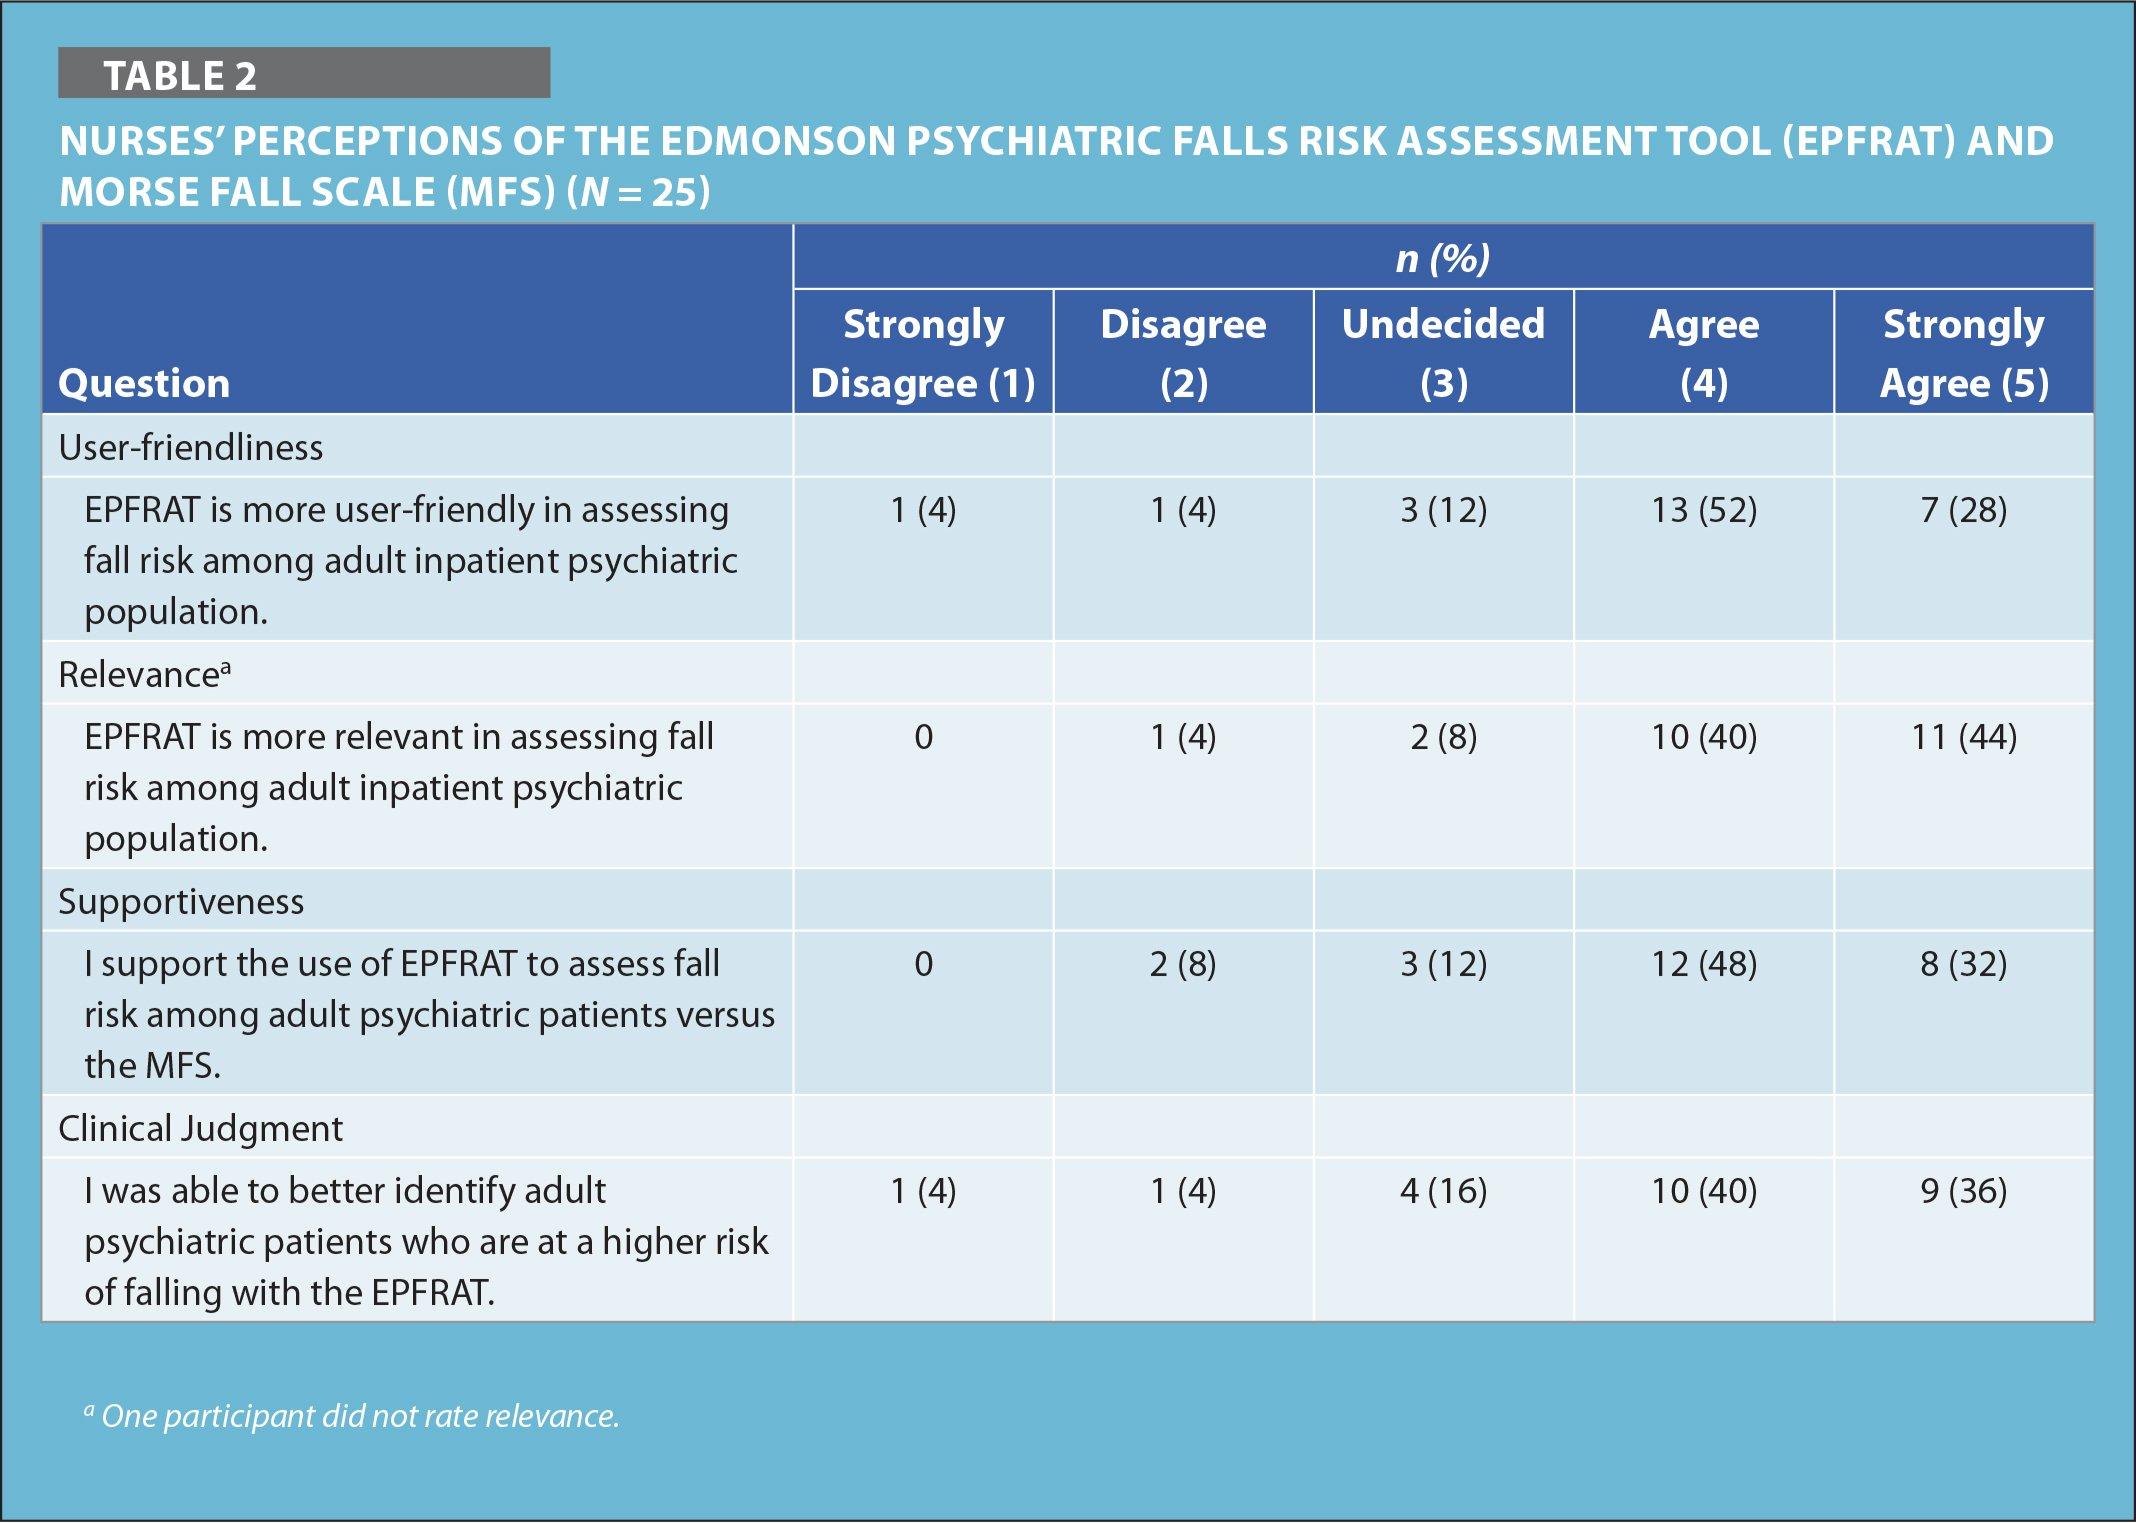 Nurses' Perceptions of the Edmonson Psychiatric Falls Risk Assessment Tool (EPFRAT) and Morse Fall Scale (MFS) (N = 25)